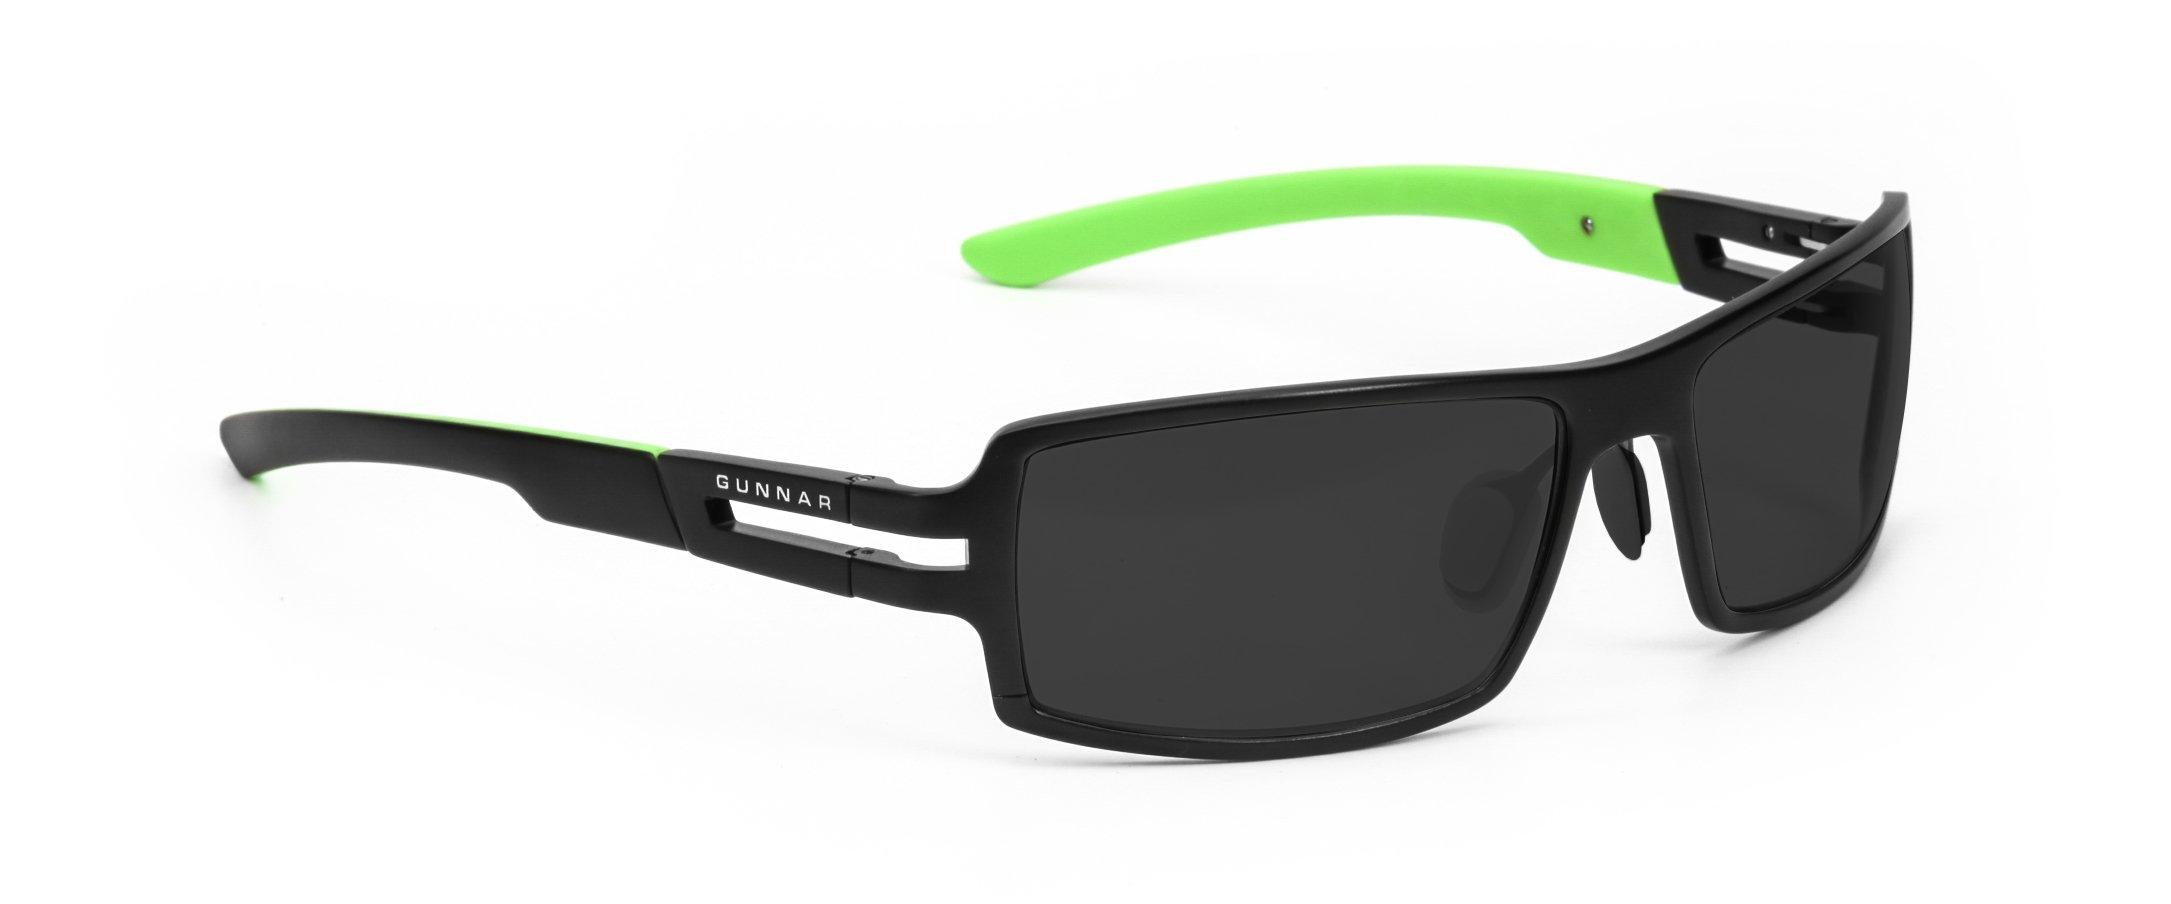 GUNNAR Gaming and Computer Eyewear/Razer RPG Sunglasses - Patented Lens, Reduce Digital Eye Strain, Block 65% of Harmful Blue Light, 100% UV